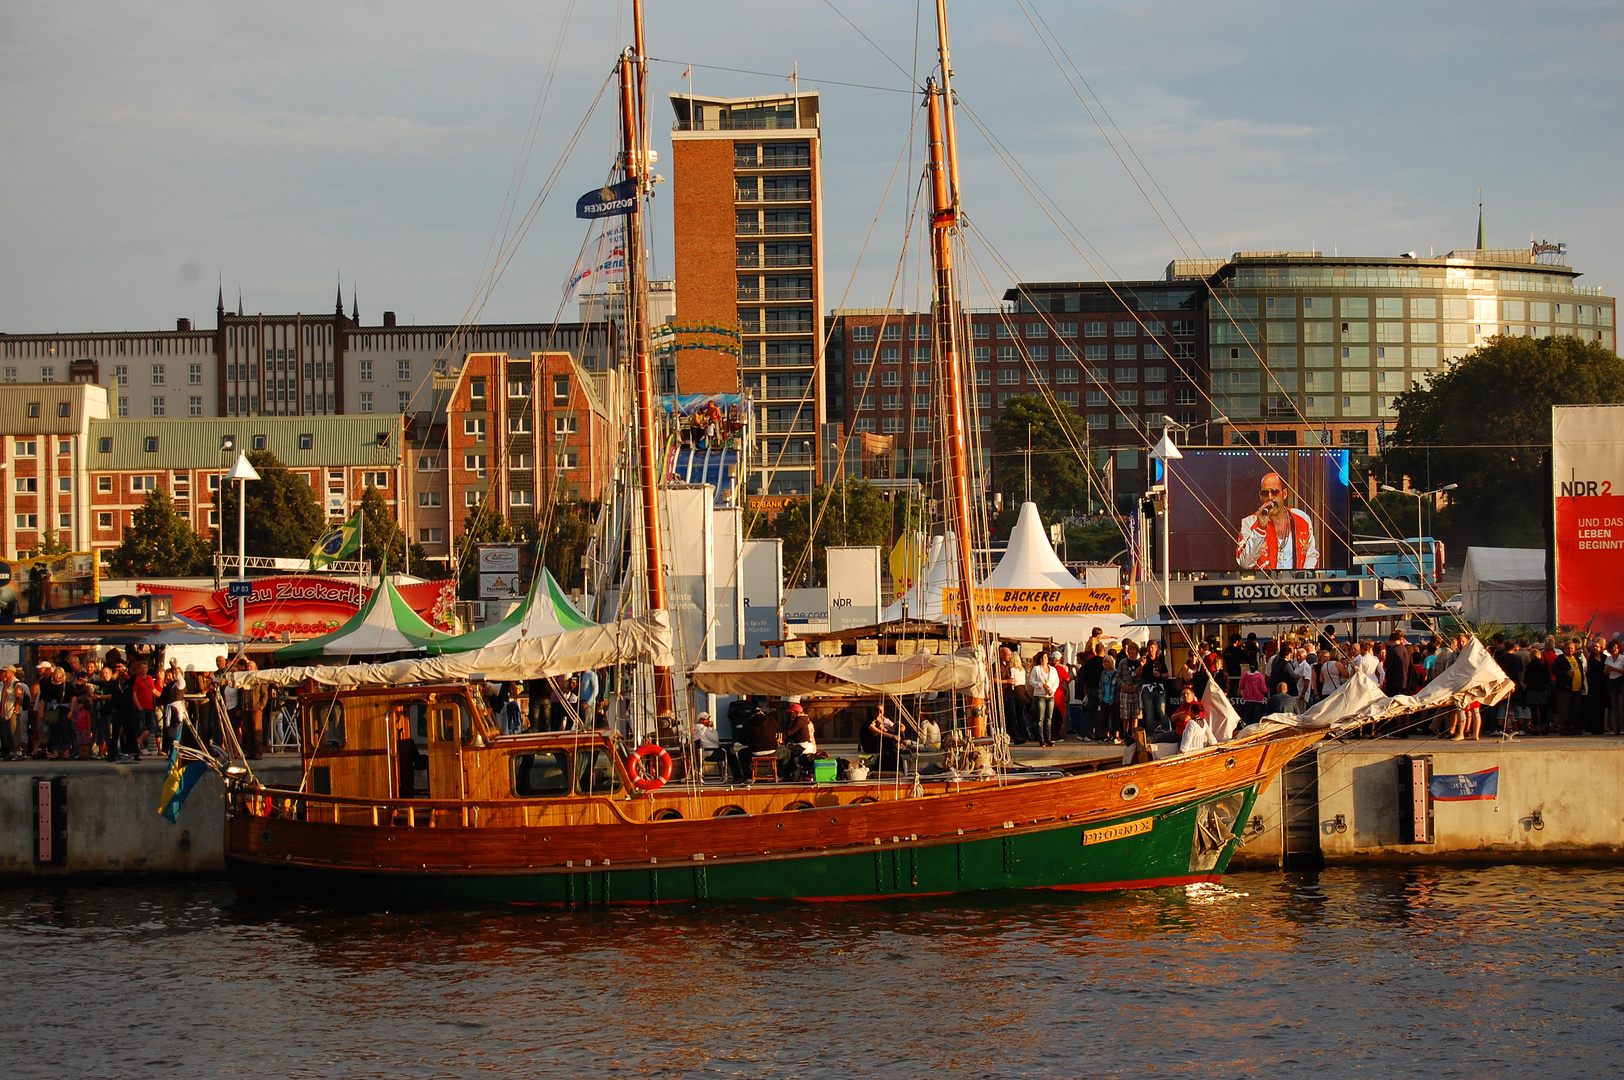 20. Rostocker Hanse Sail 3